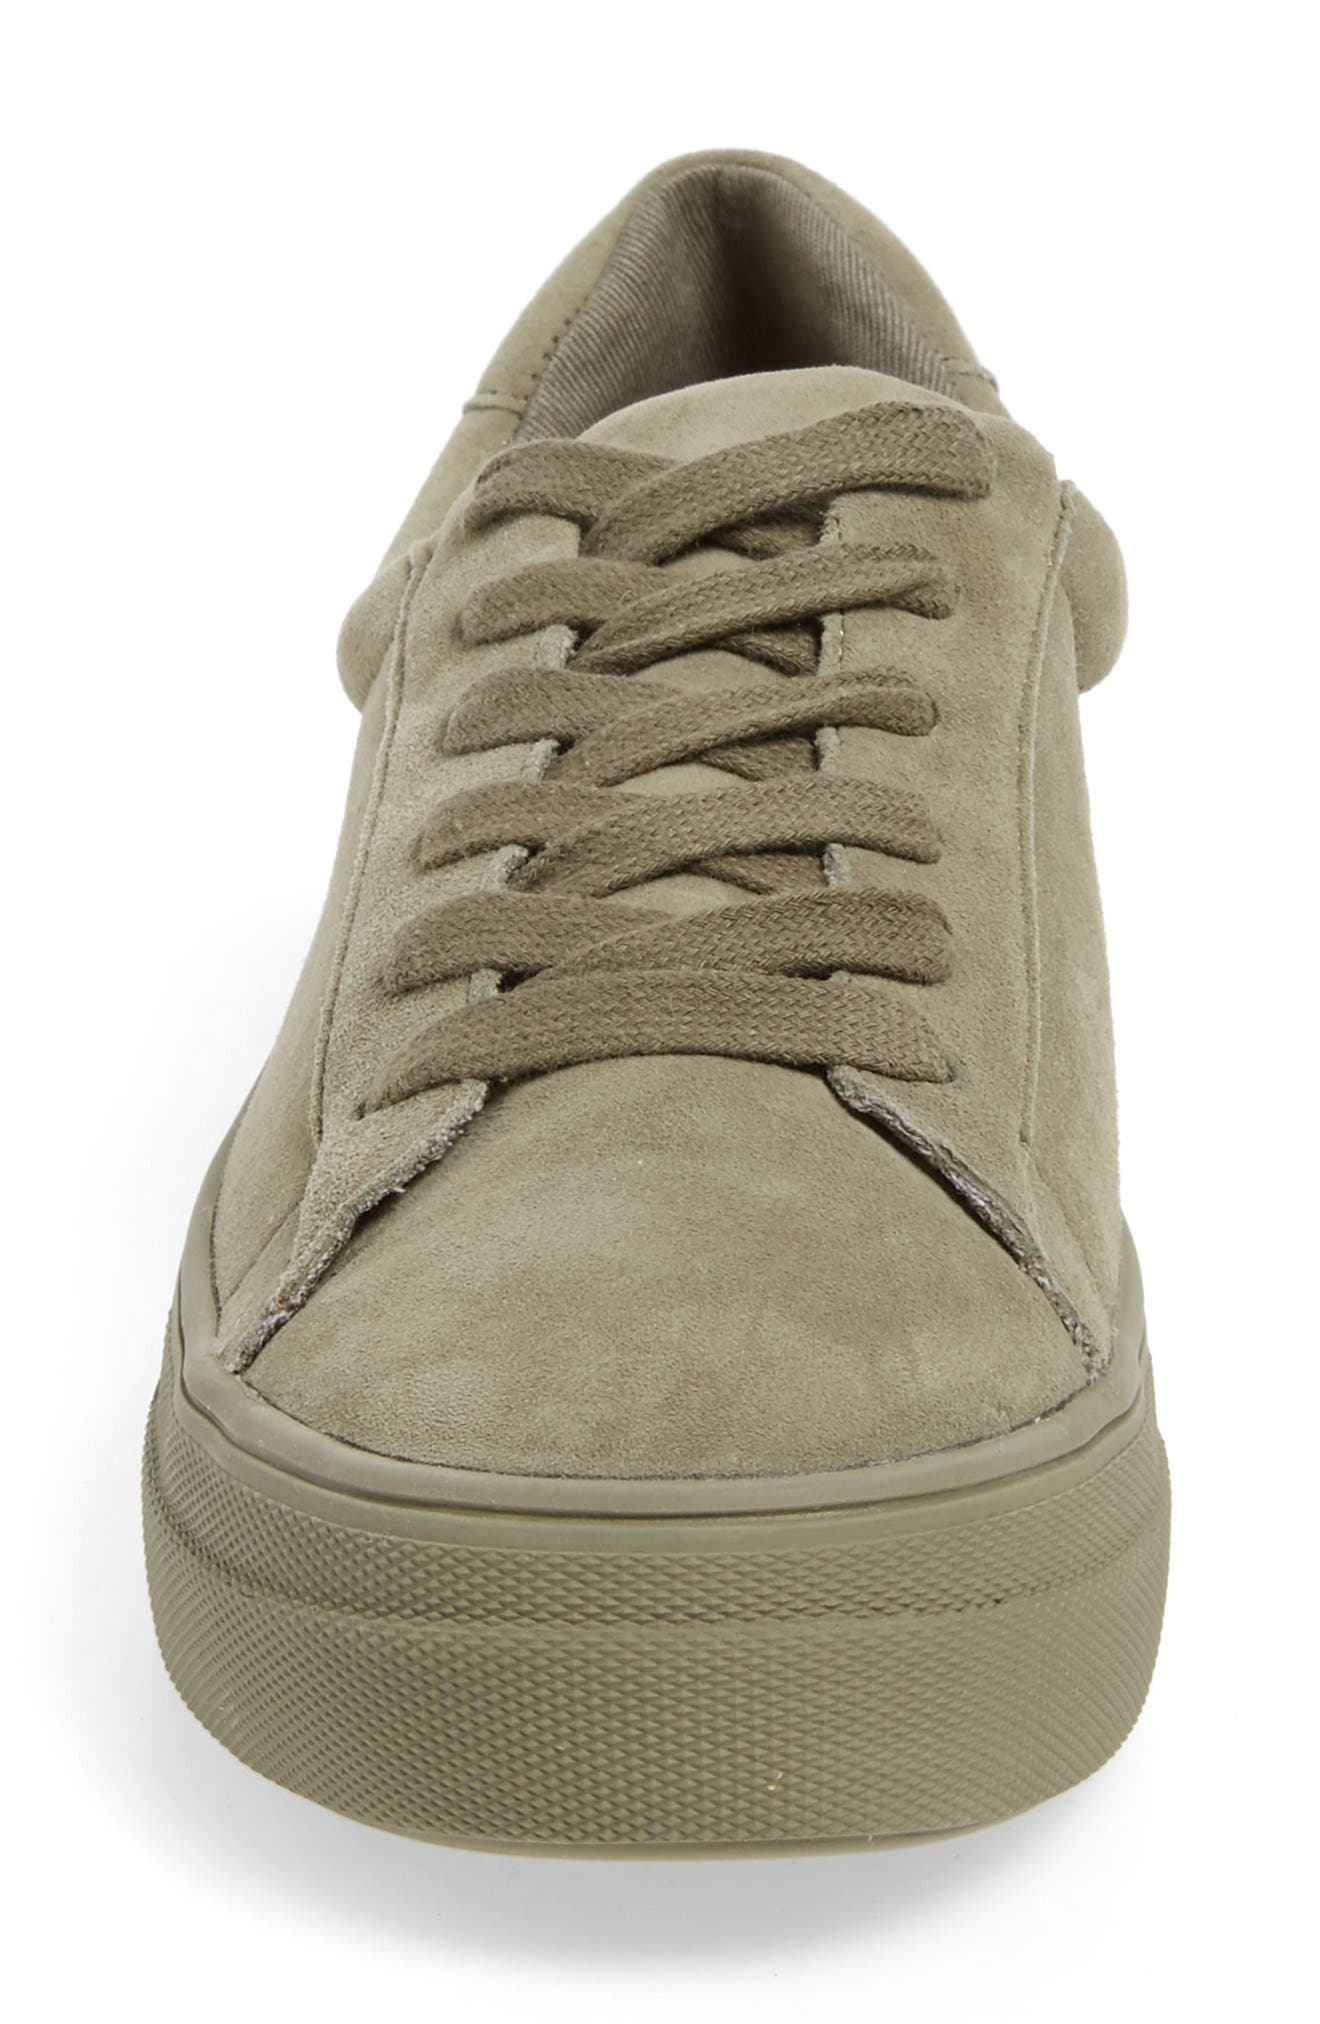 Gisela Low Top Sneaker,                             Alternate thumbnail 11, color,